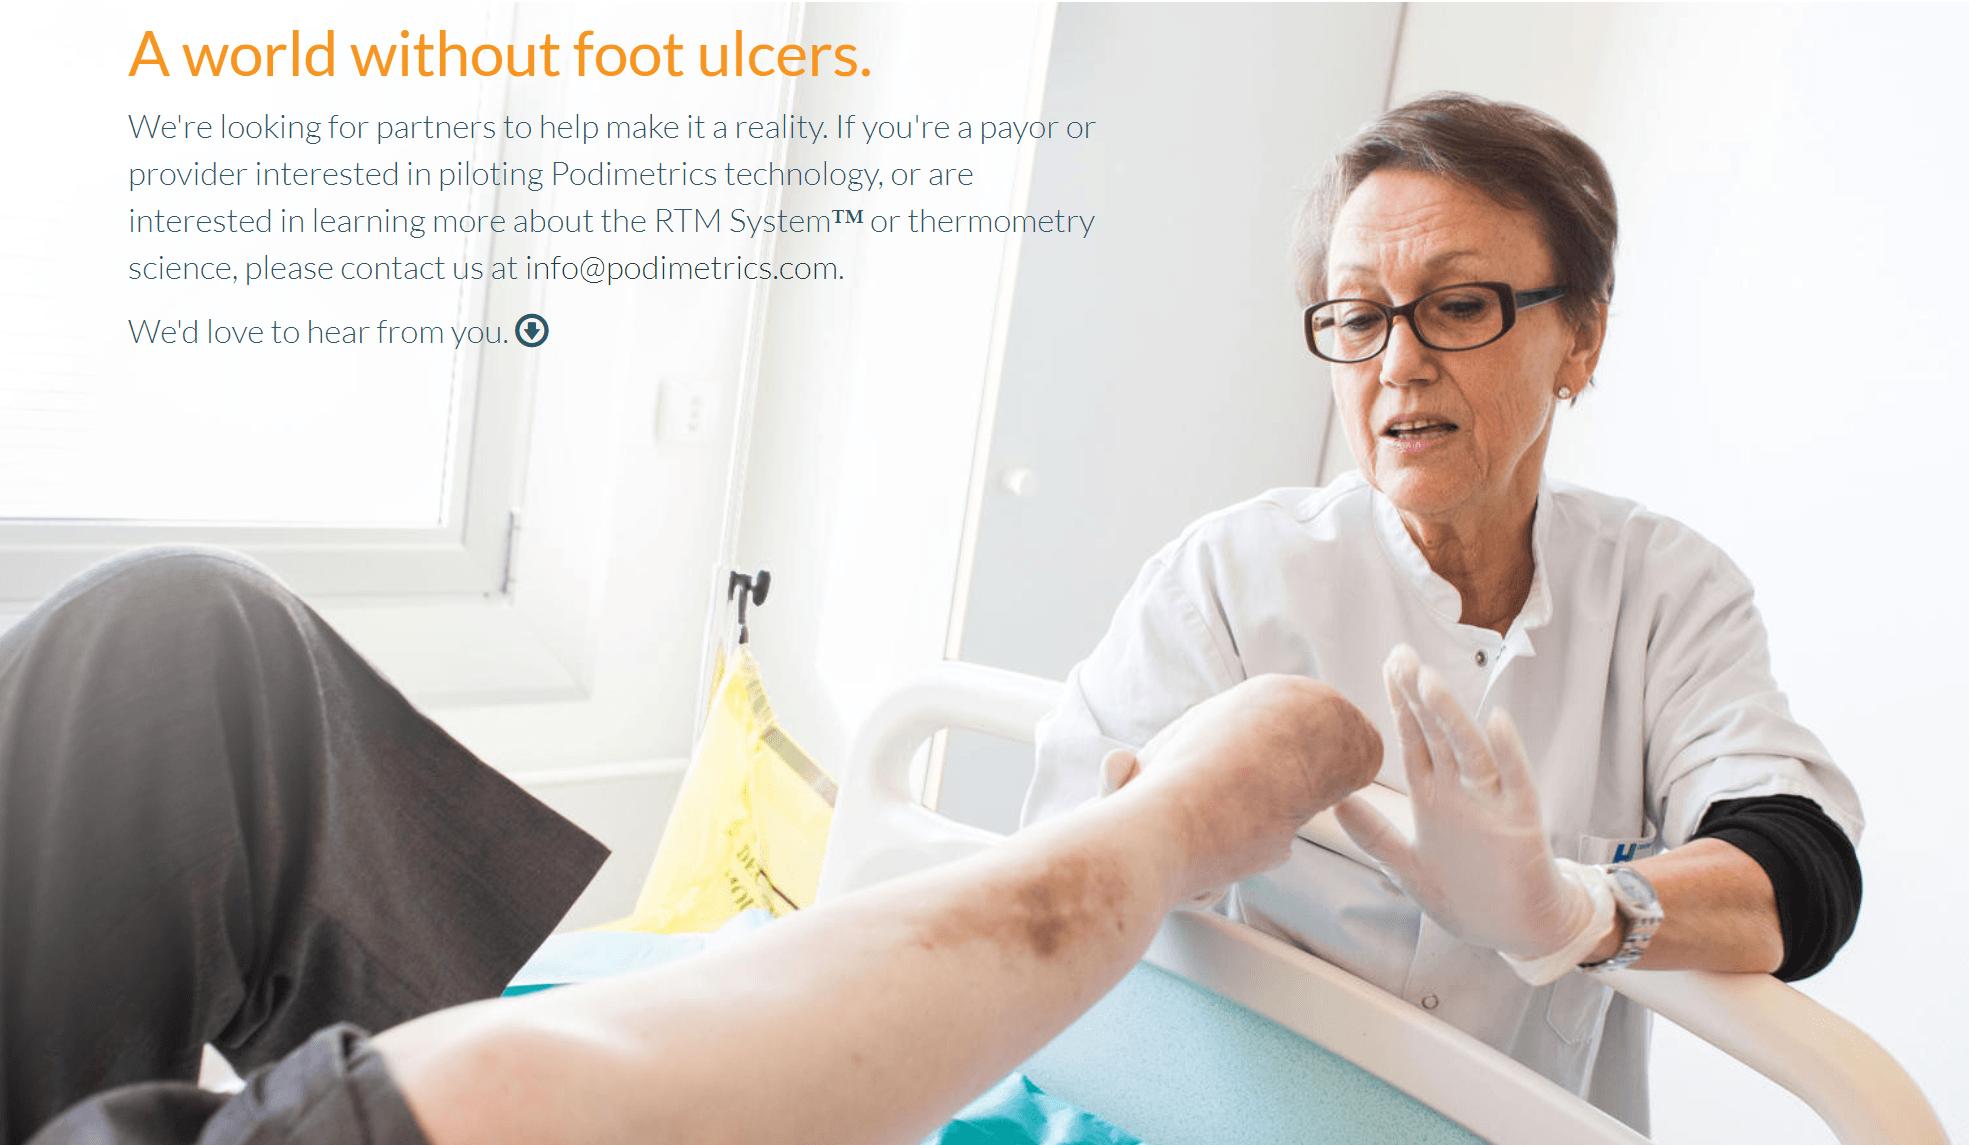 VA to Deploy Podimetrics SmartMat Regionally to Prevent Diabetic Foot Ulcers